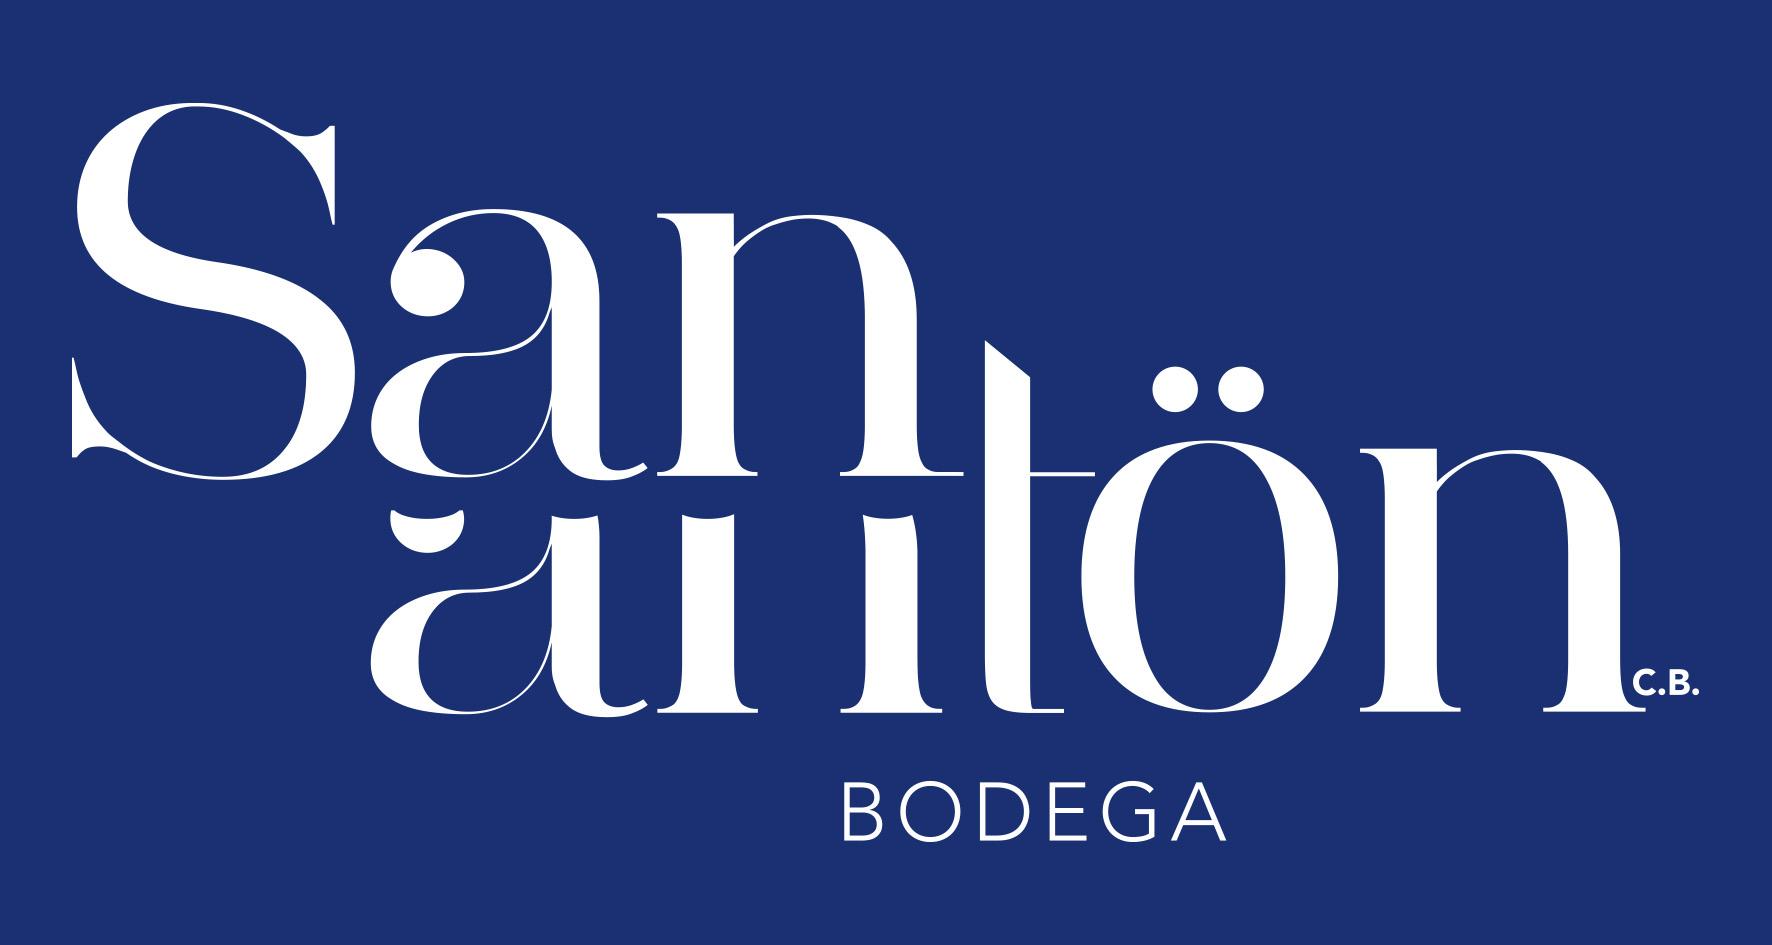 LogoNegativoBSanAnton.jpg